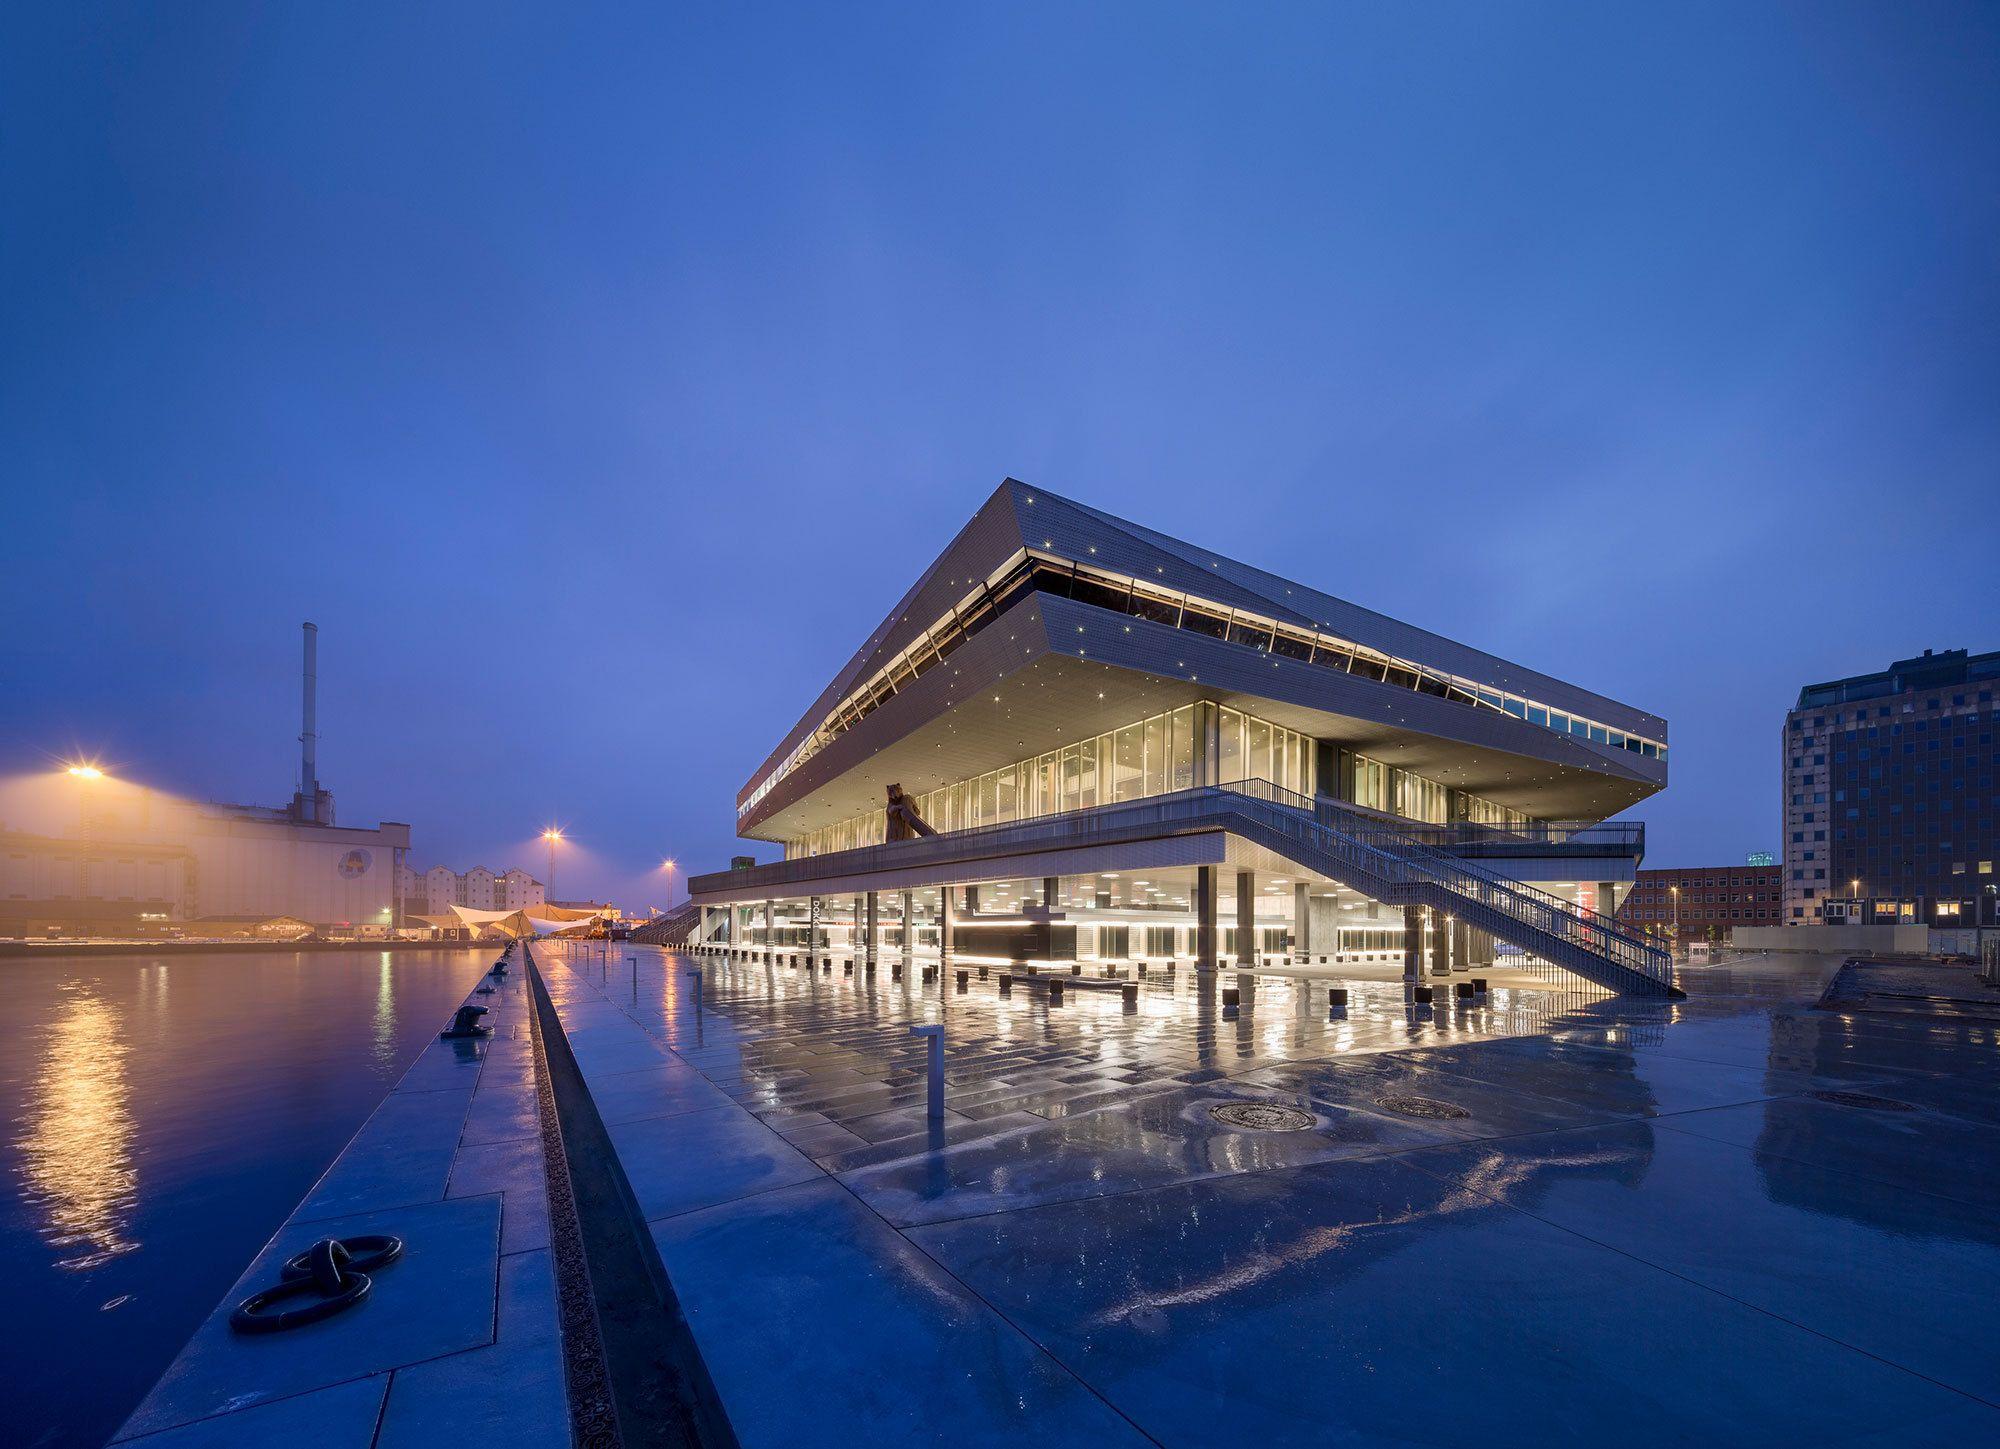 Skandinaviens gr te bibliothek dokk1 von schmidt hammer lassen in aarhus er ffnet - Architecture moderne residentielle schmidt lepper ...